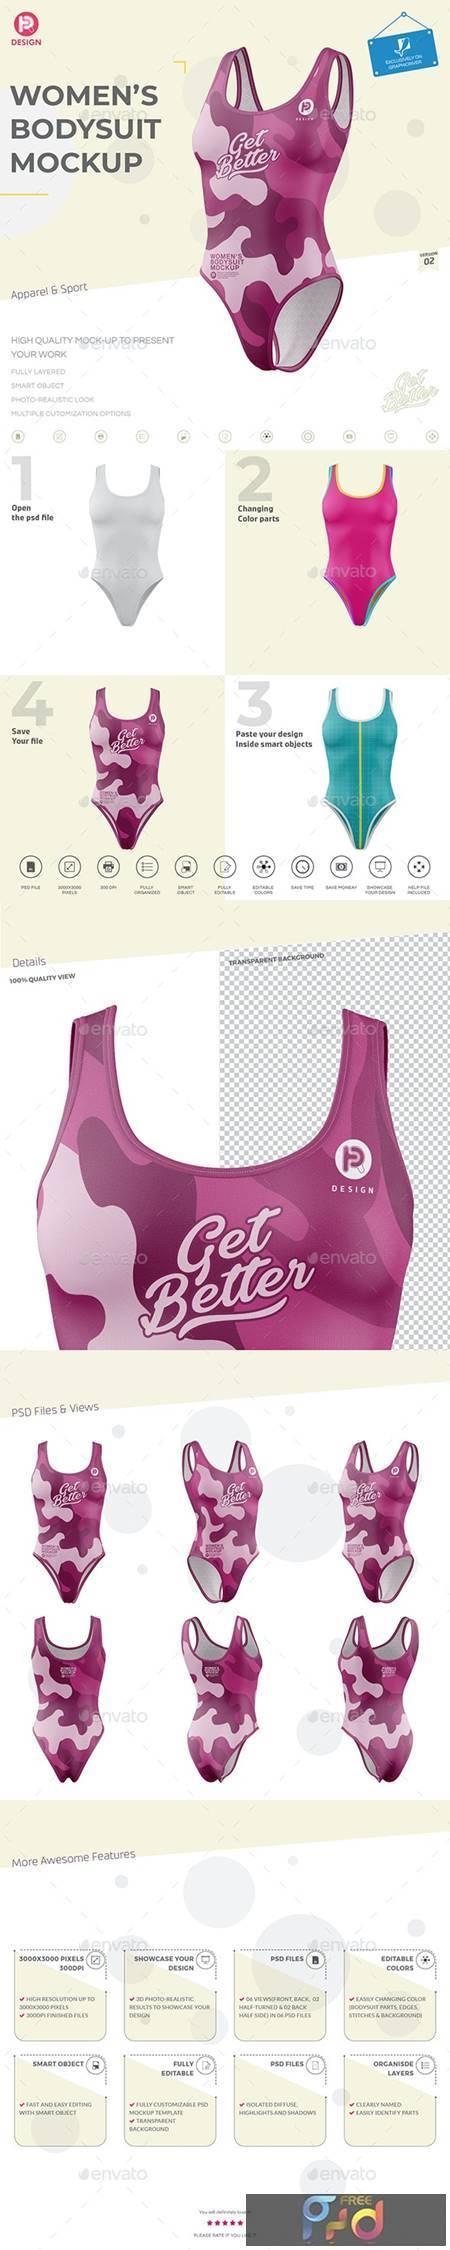 Womens Bodysuit Mockup V2 26697053 1